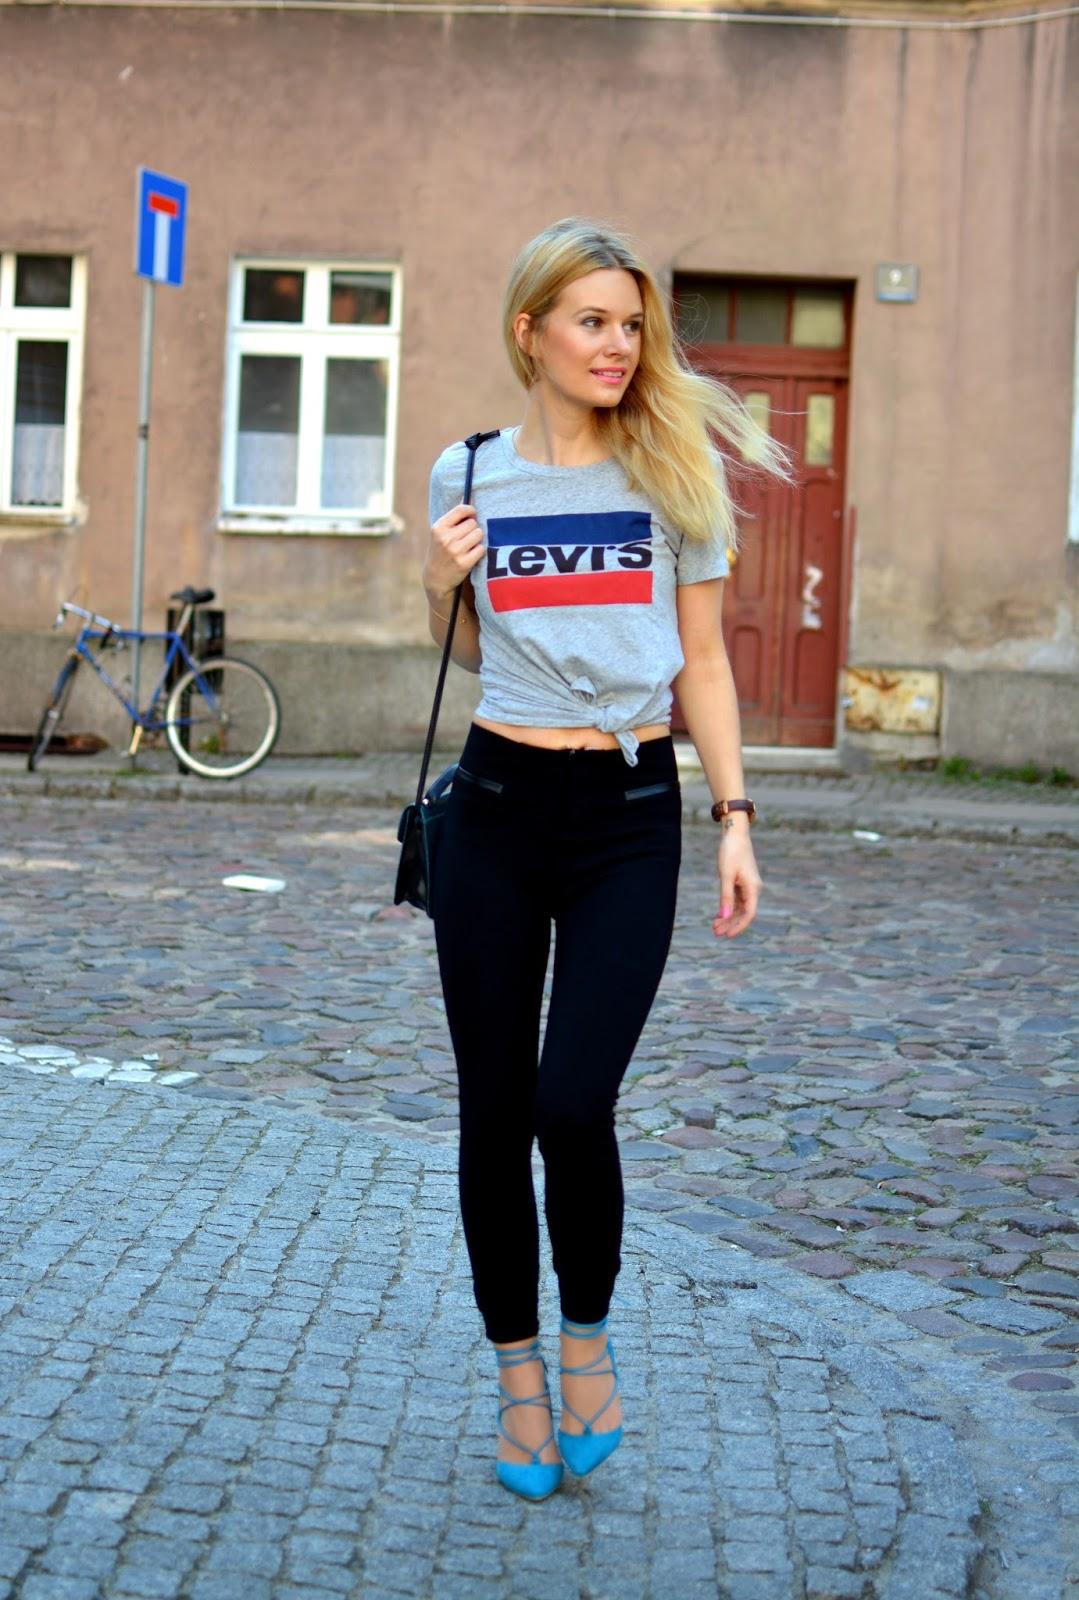 z wiązaniami, t-shirt, levis, poznan, stylizacja, bloger, klasyk, vintage, turkus